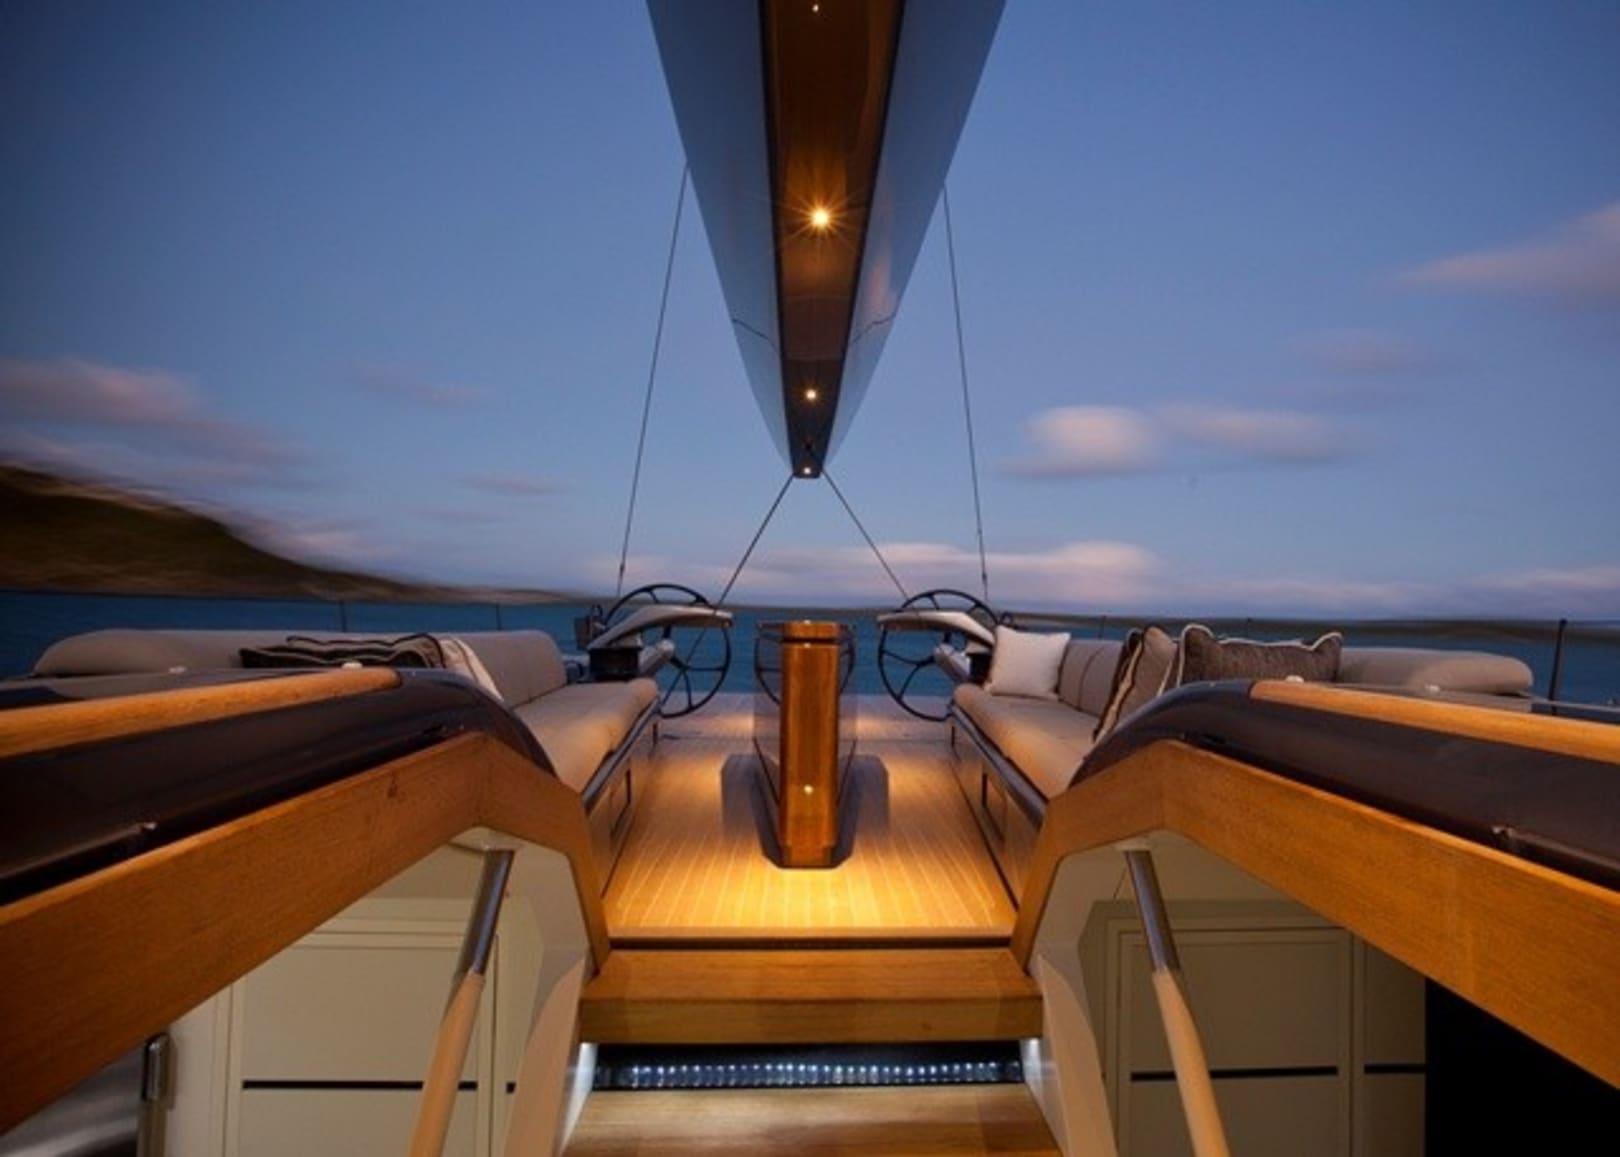 Aegir Yacht For Sale Carbon Ocean Yachts Luxury Temperature Gauge Wiring S Y 4